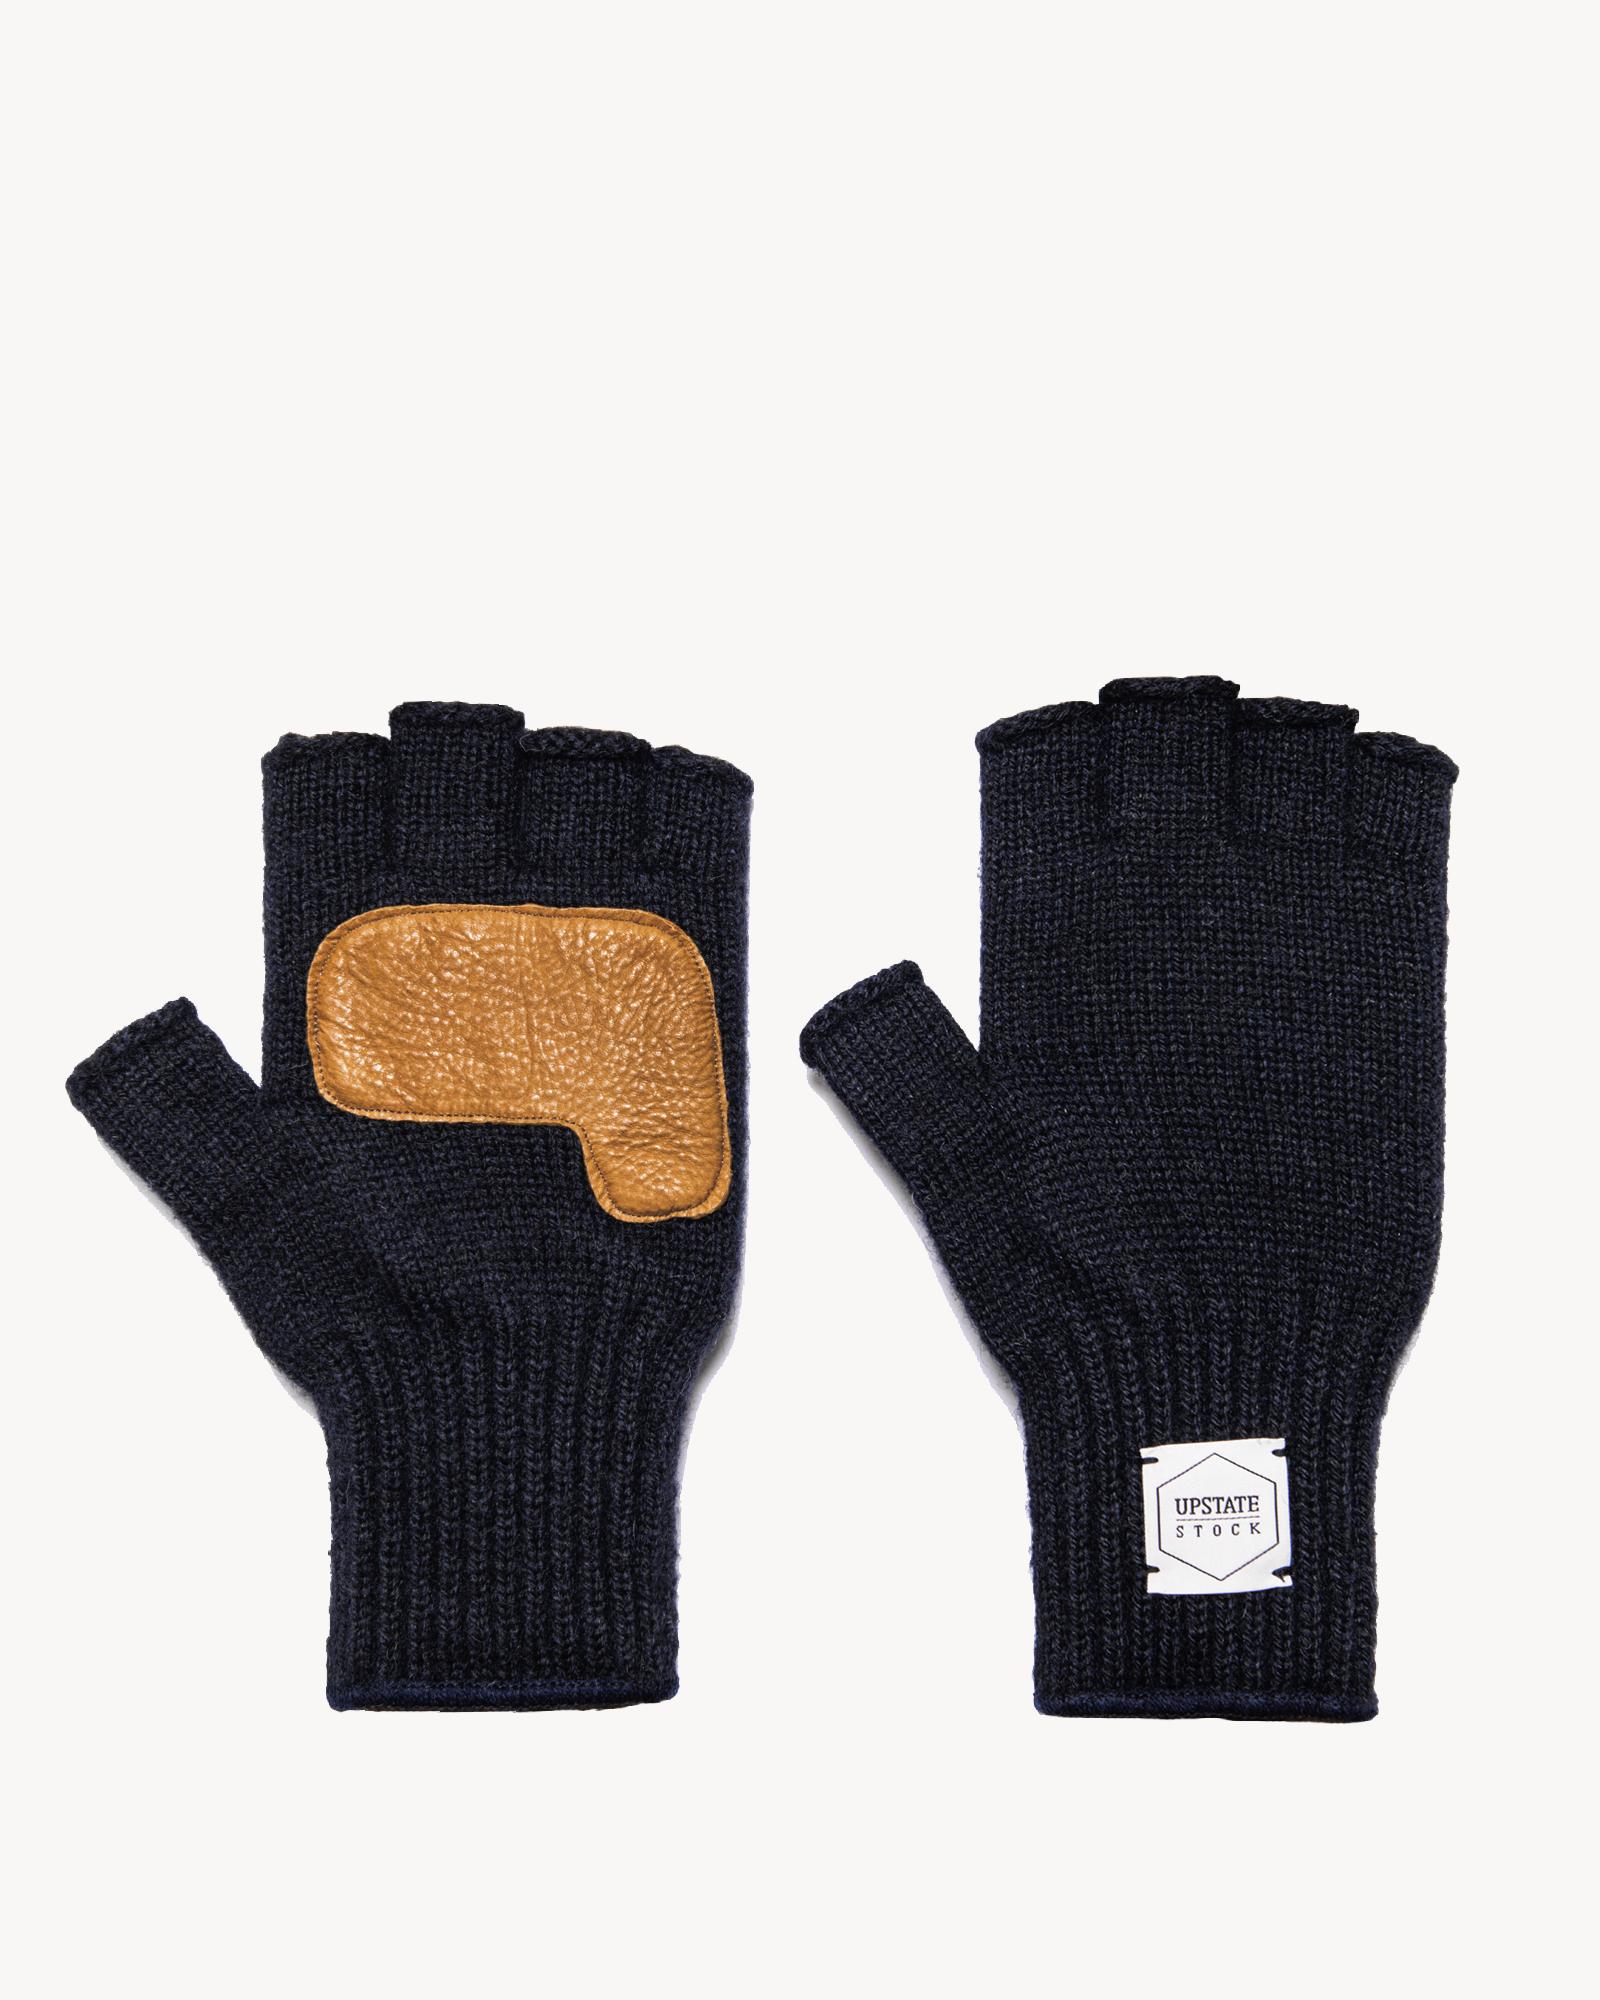 Upstate Stock Upstate Stock Wool Fingerless Glove w/Deerskin